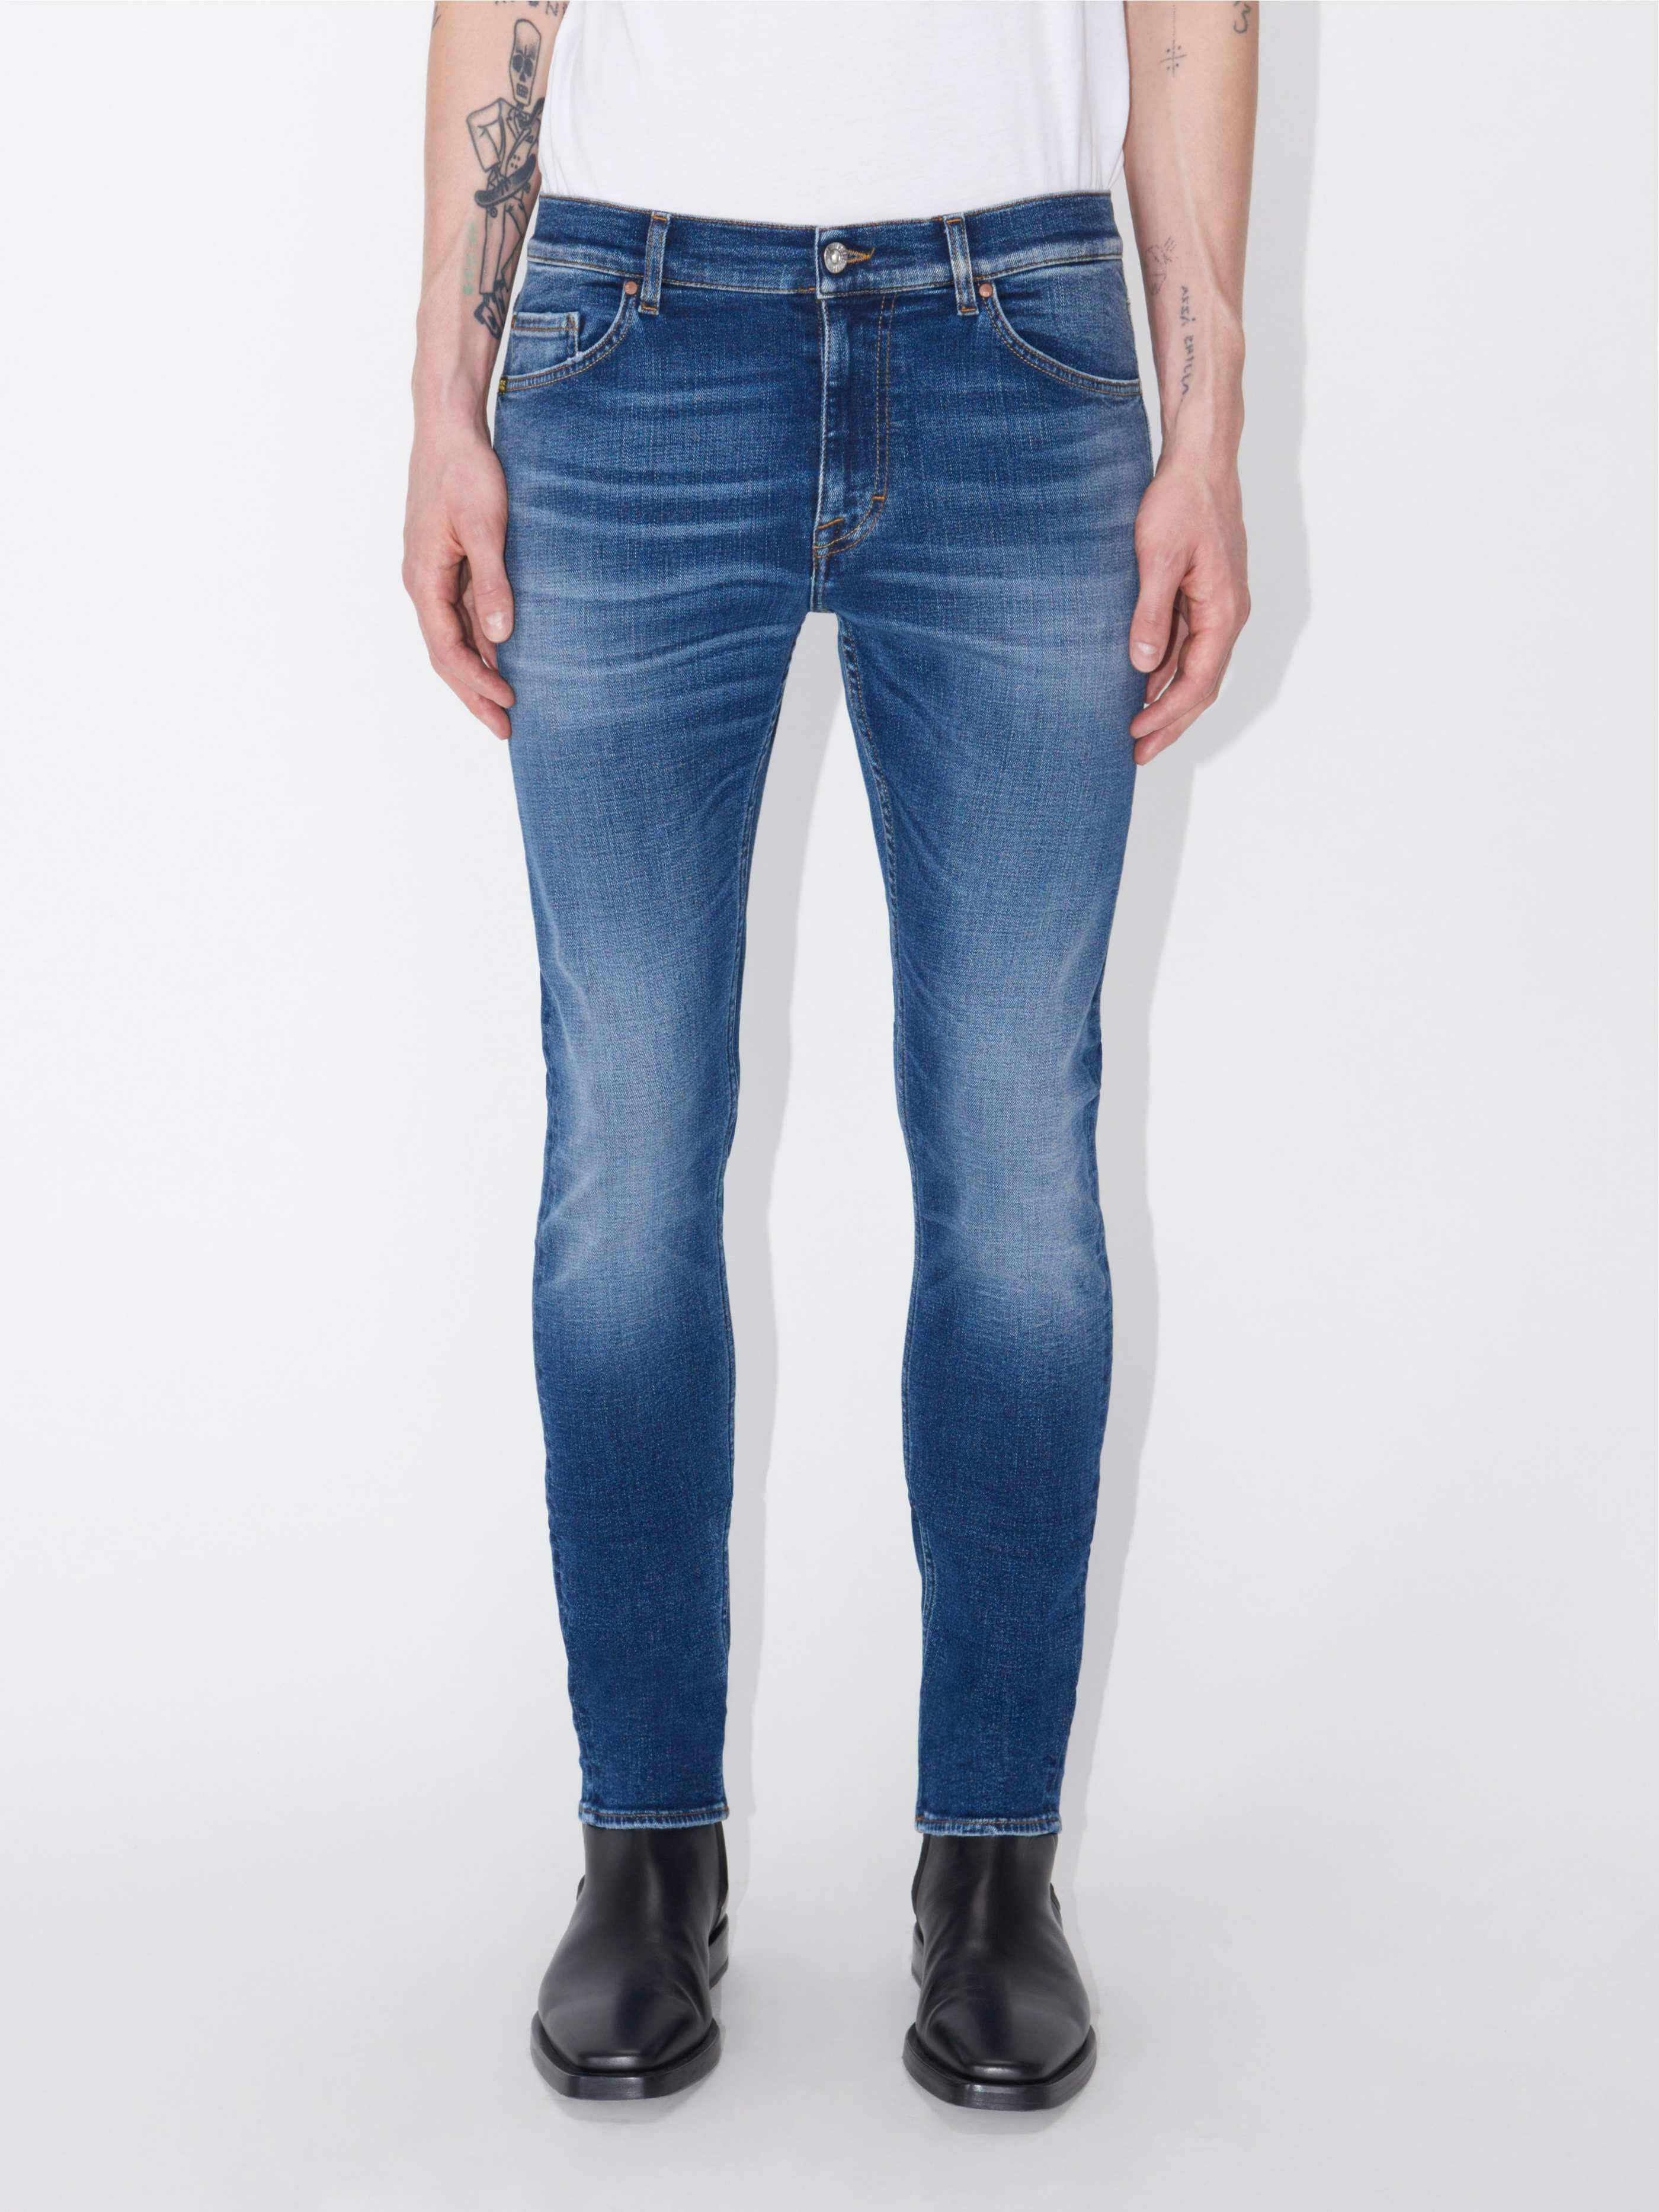 Evolve Jeans Buy Jeans online